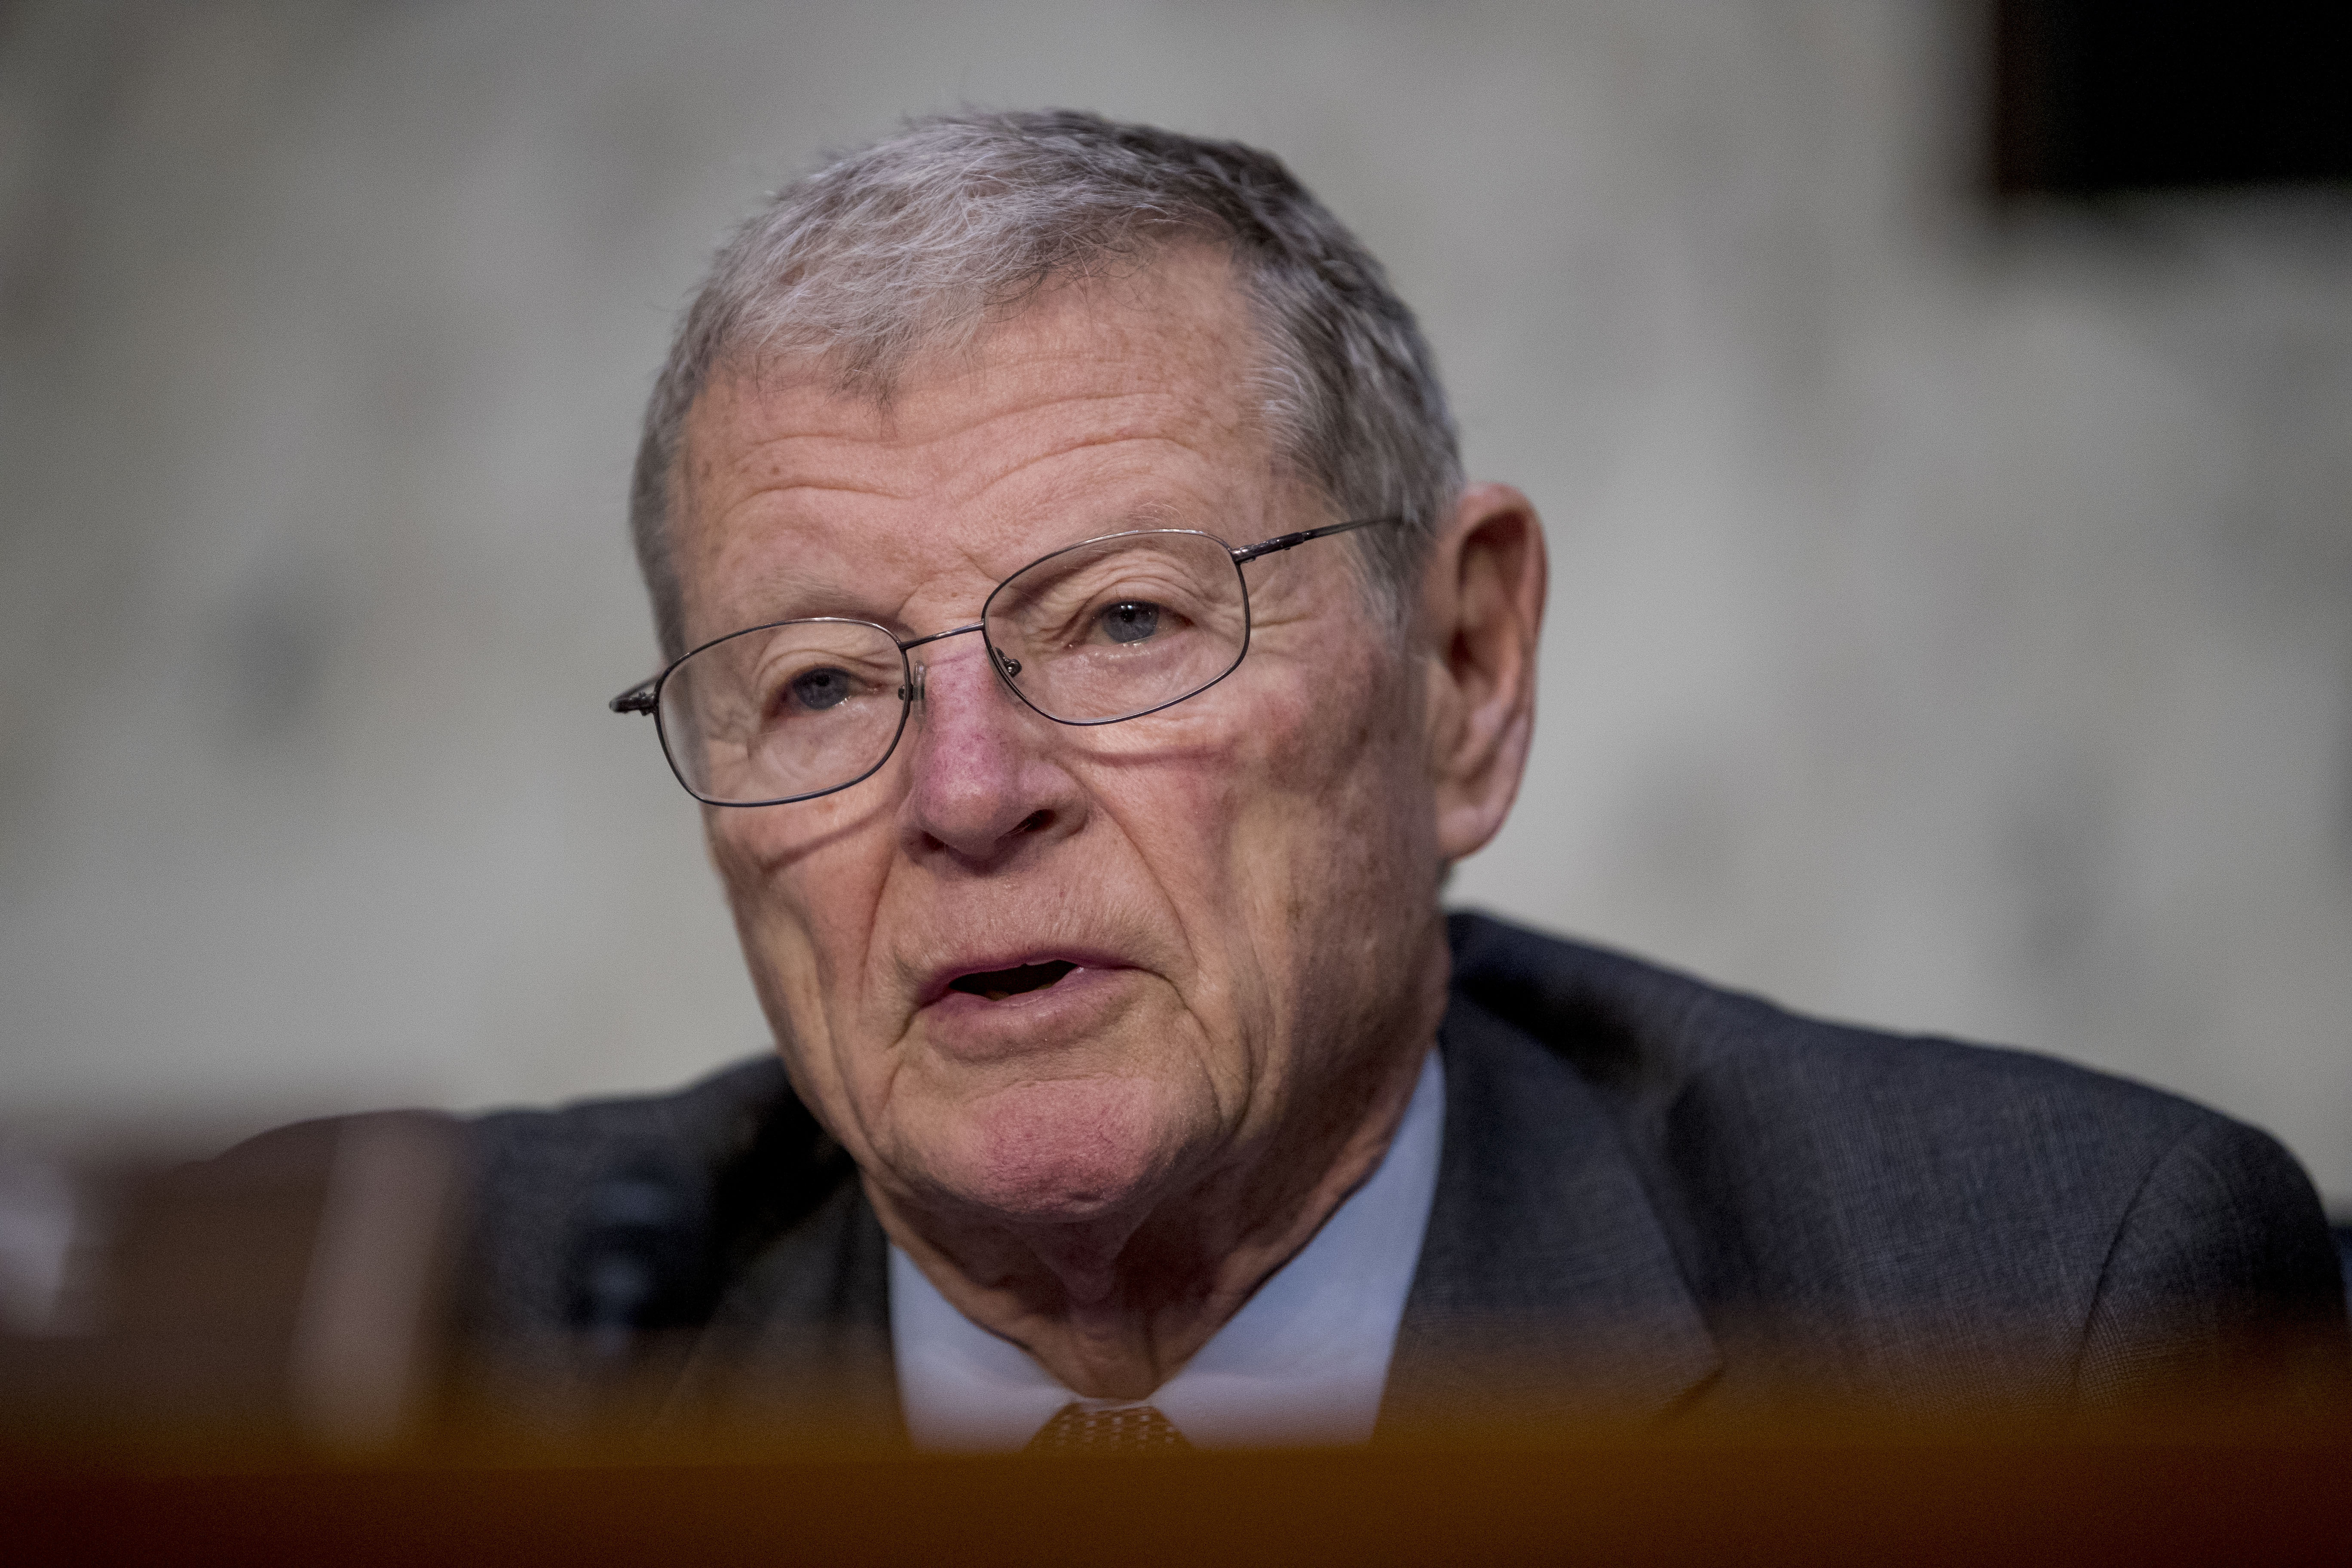 Inhofe 'shocked' by Democratic request to delay defense bill for presidential debates